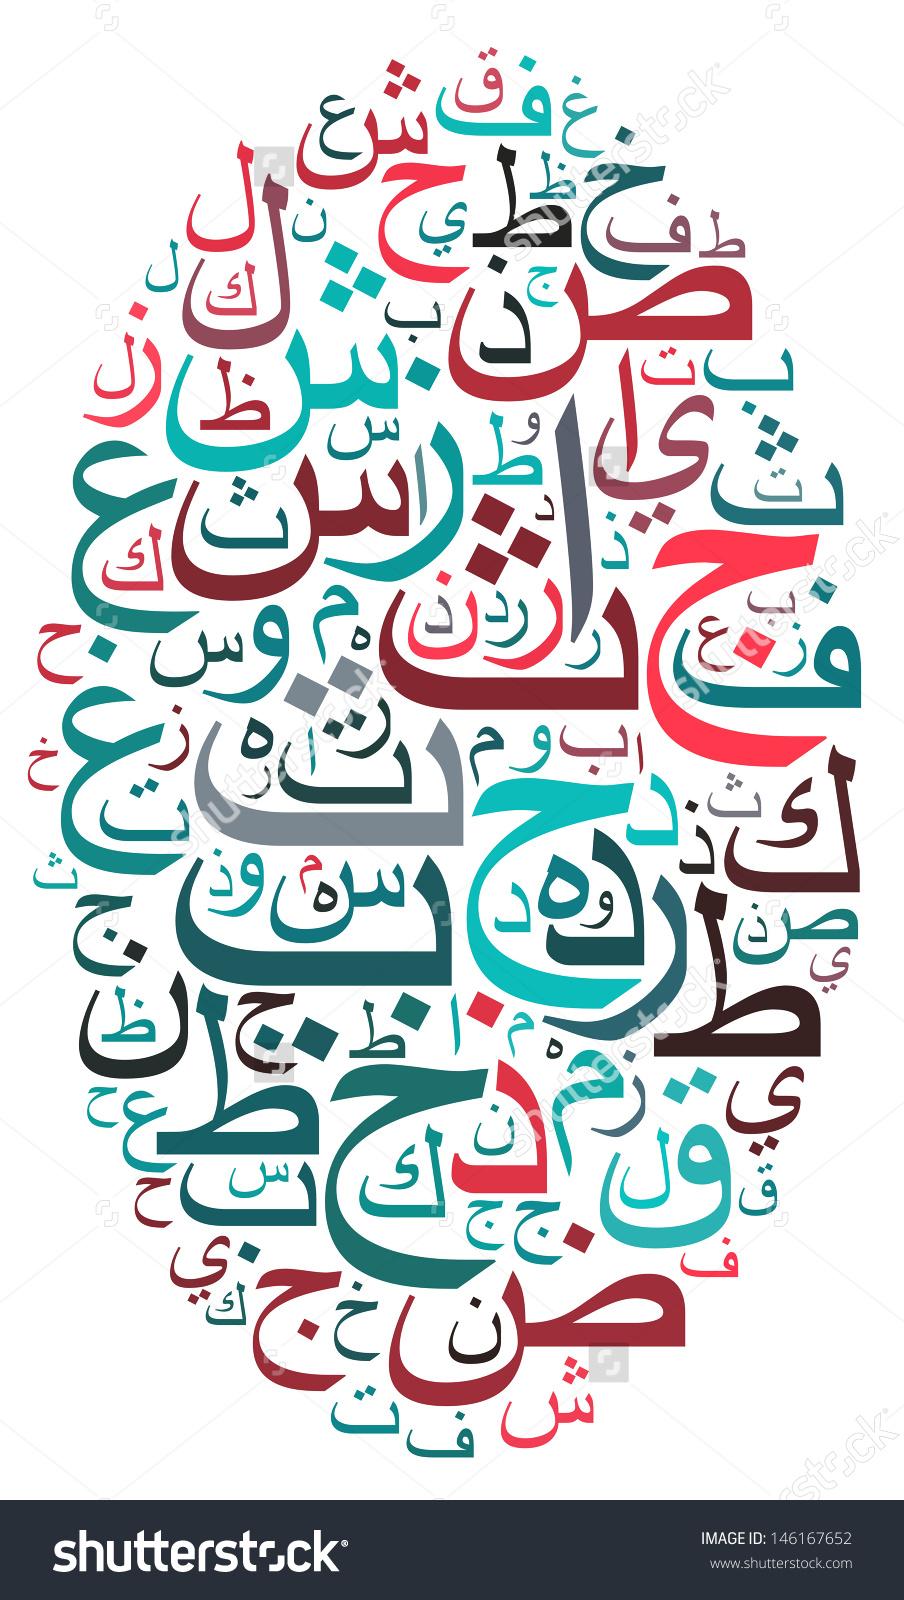 Arabic letters clipart jpg stock Clipart arabic letters - ClipartFest jpg stock